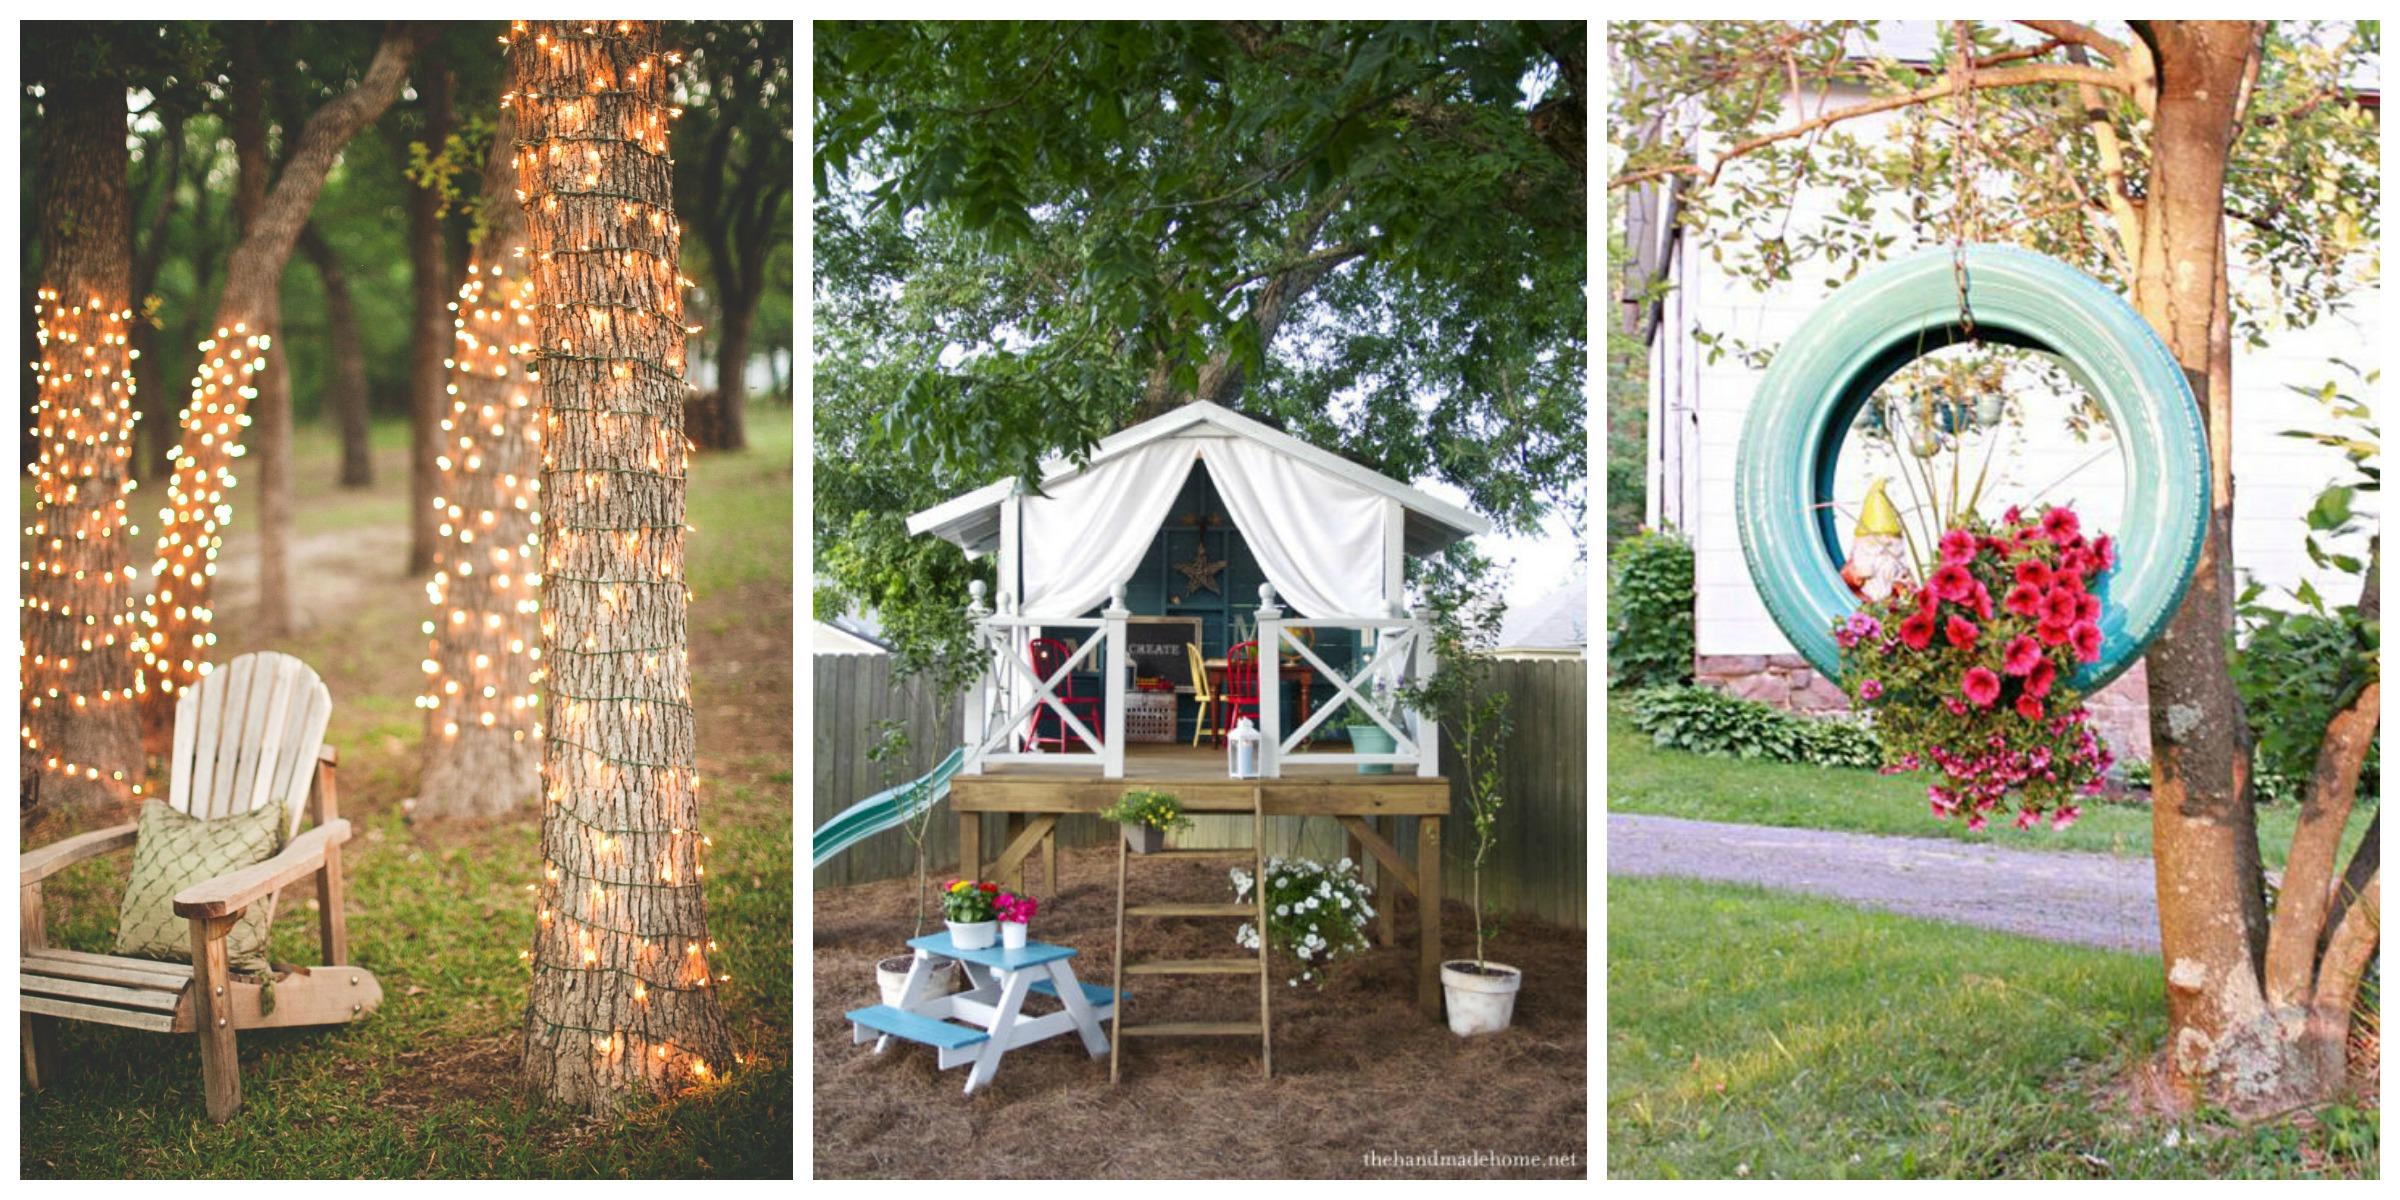 54 DIY Backyard Design Ideas - DIY Backyard Decor Tips on Backyard Decor Ideas  id=85143